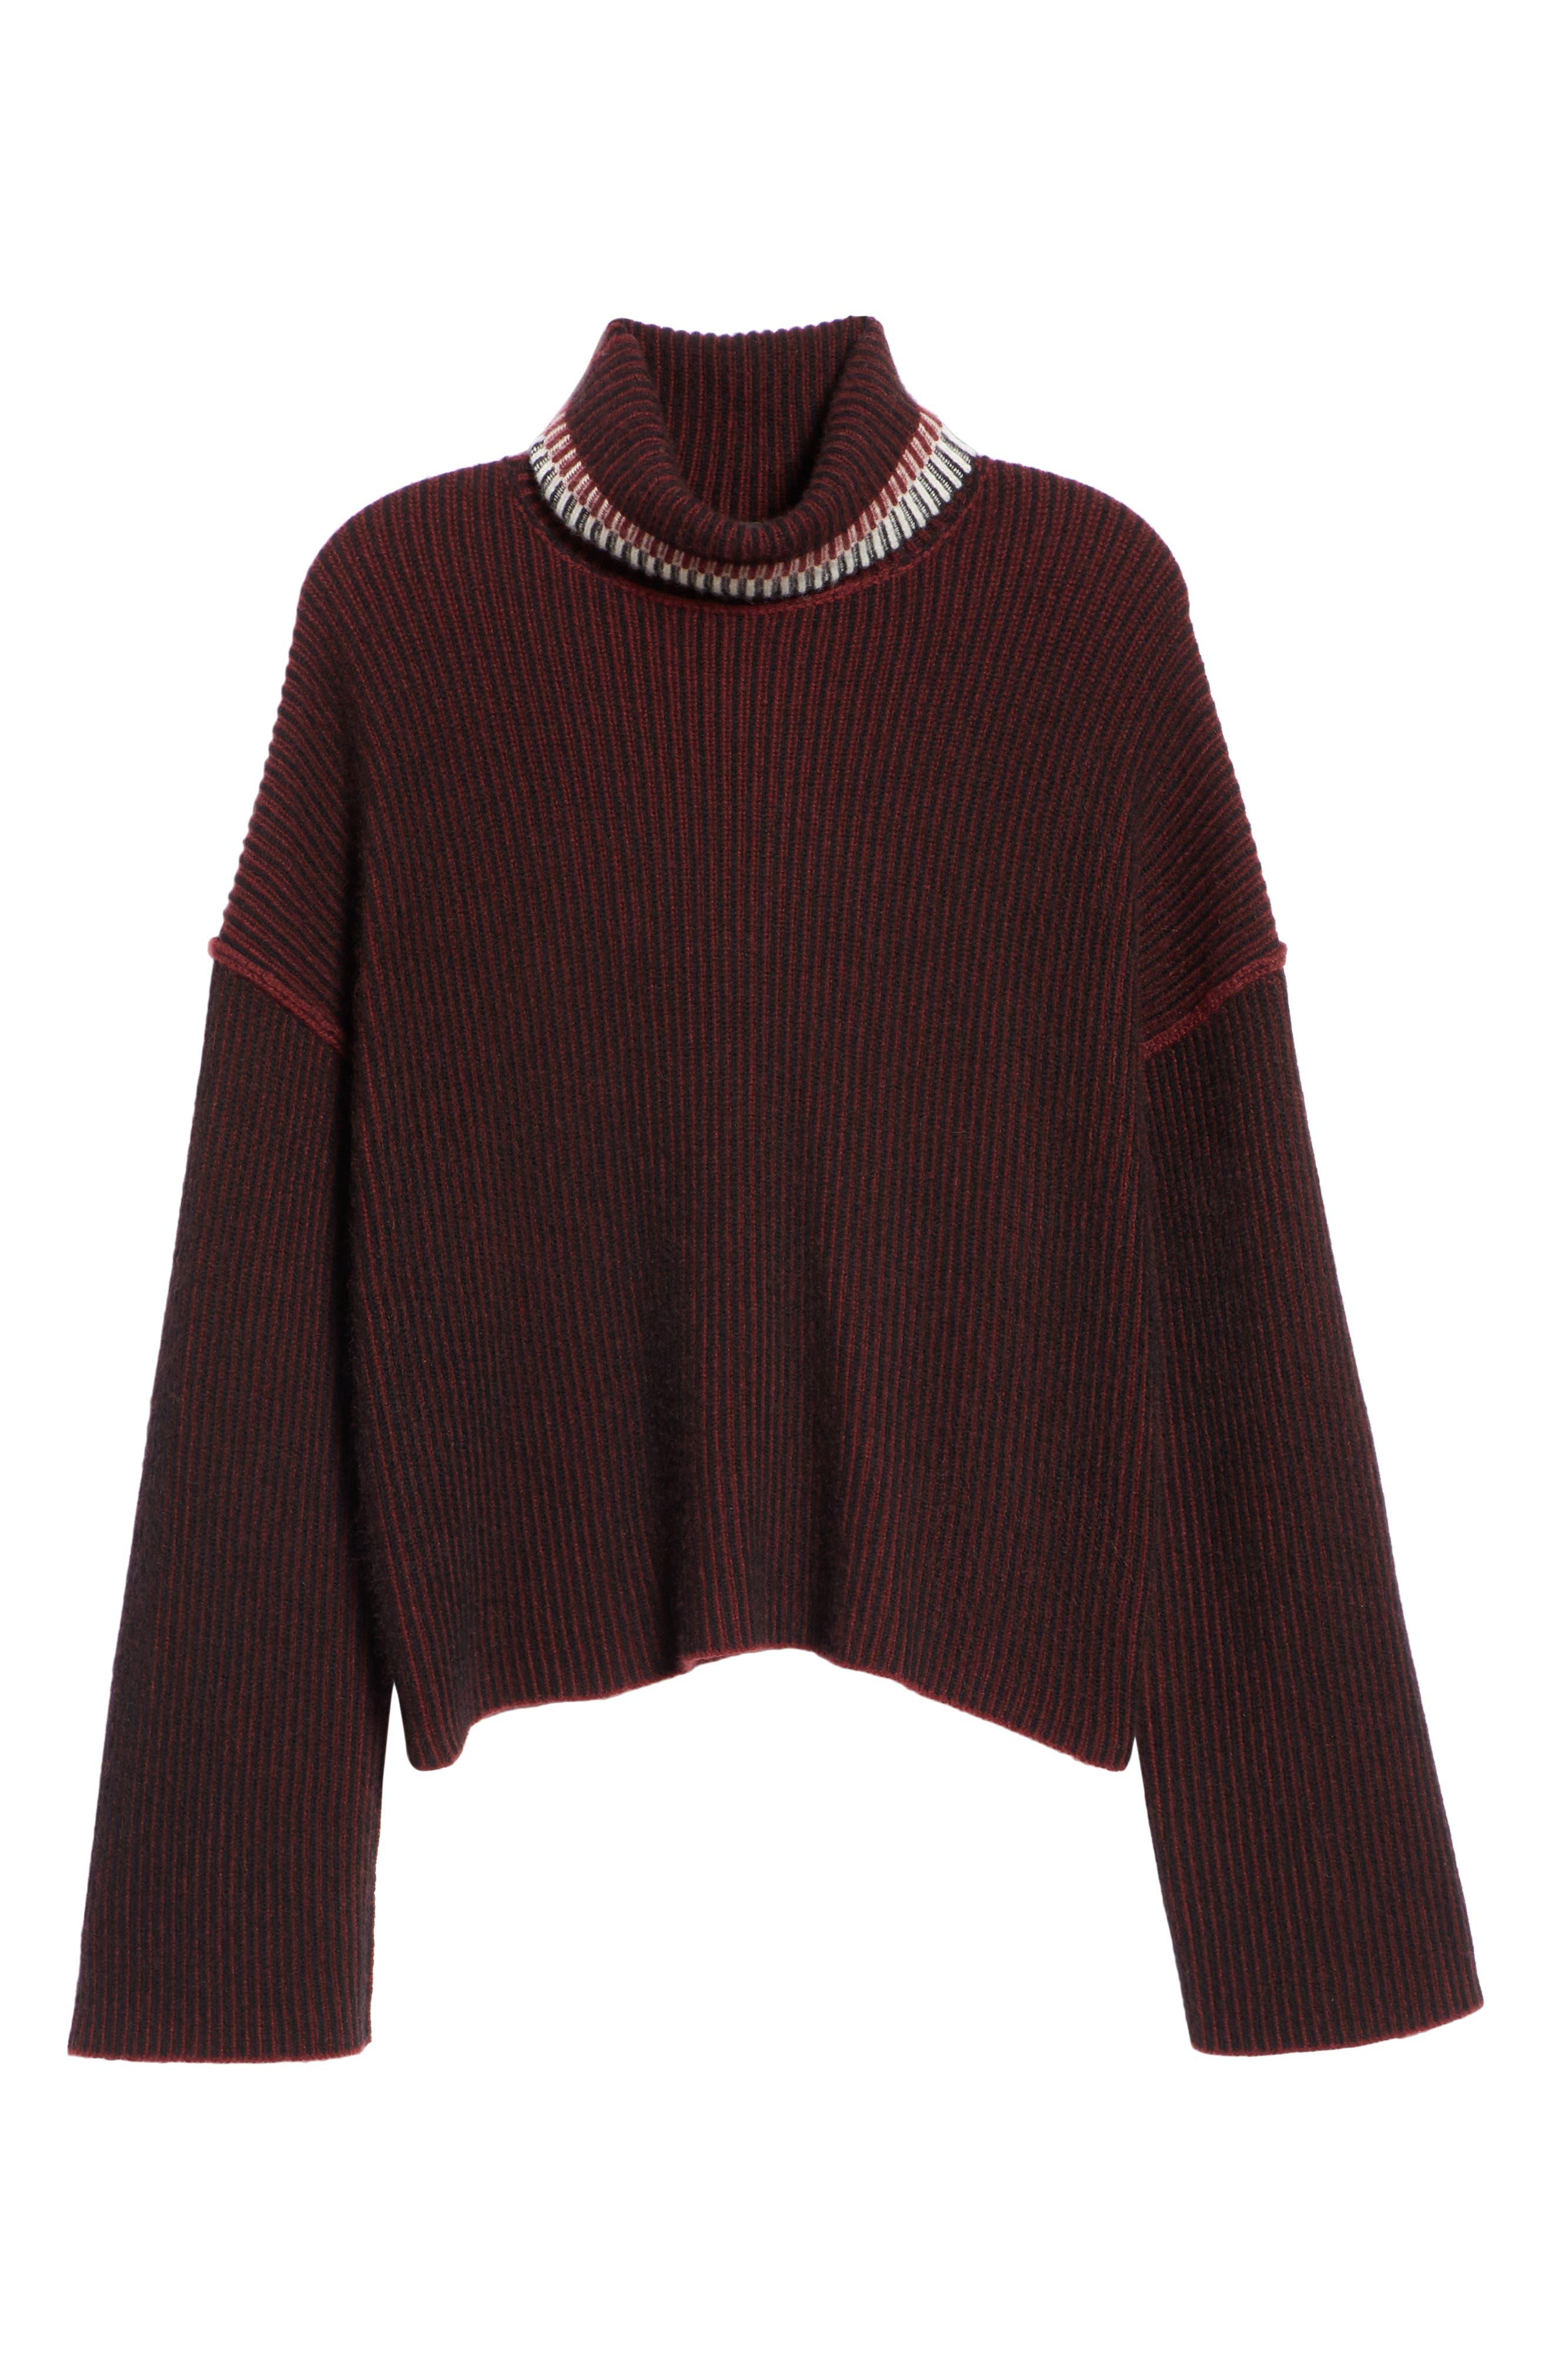 Oversize Cashmere Turtleneck Sweater,                             Alternate thumbnail 6, color,                             DARK CURRANT MIX